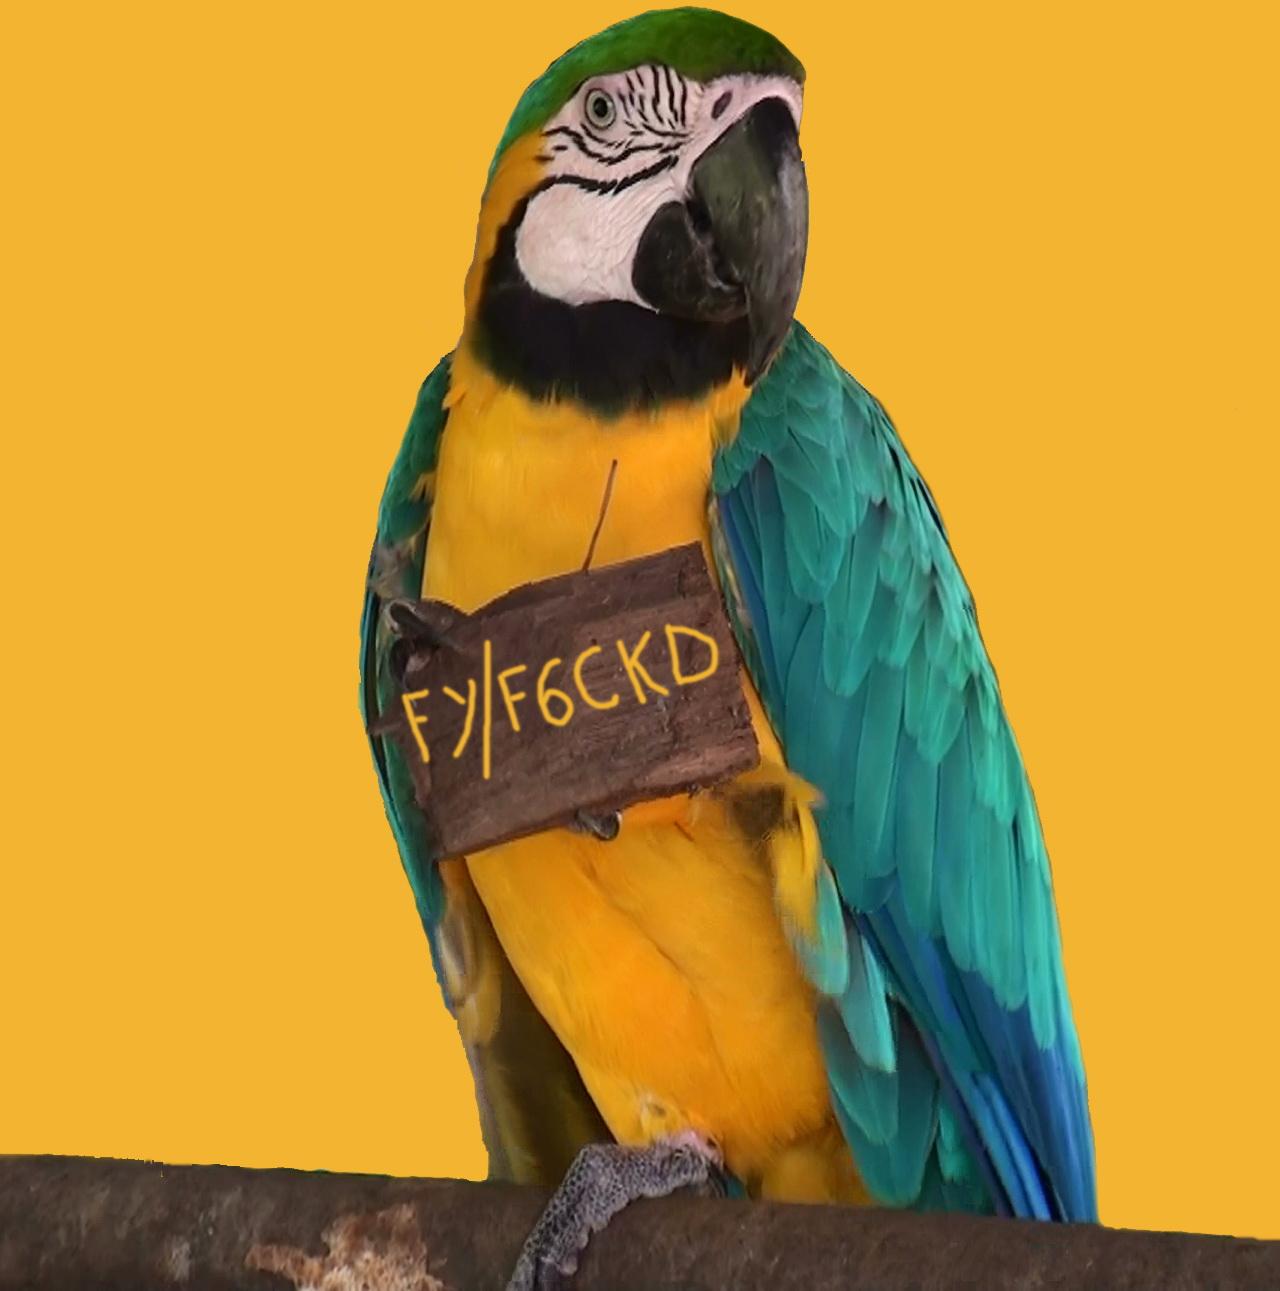 FY_F6CKD_12_2012